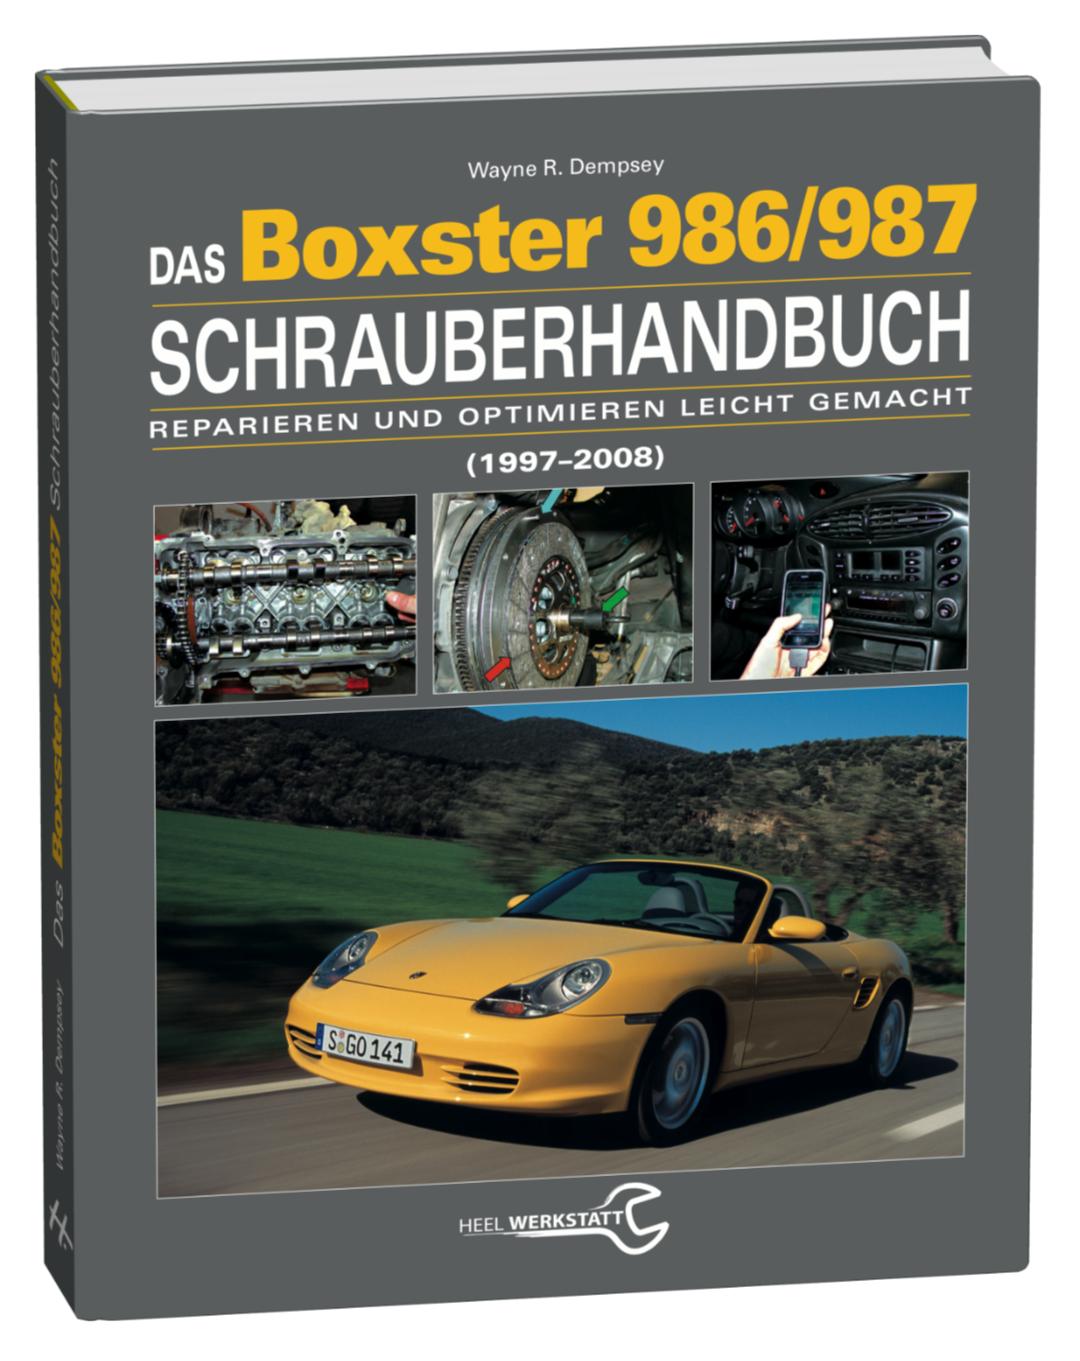 Boxster 986/987 Schrauberhandbuch